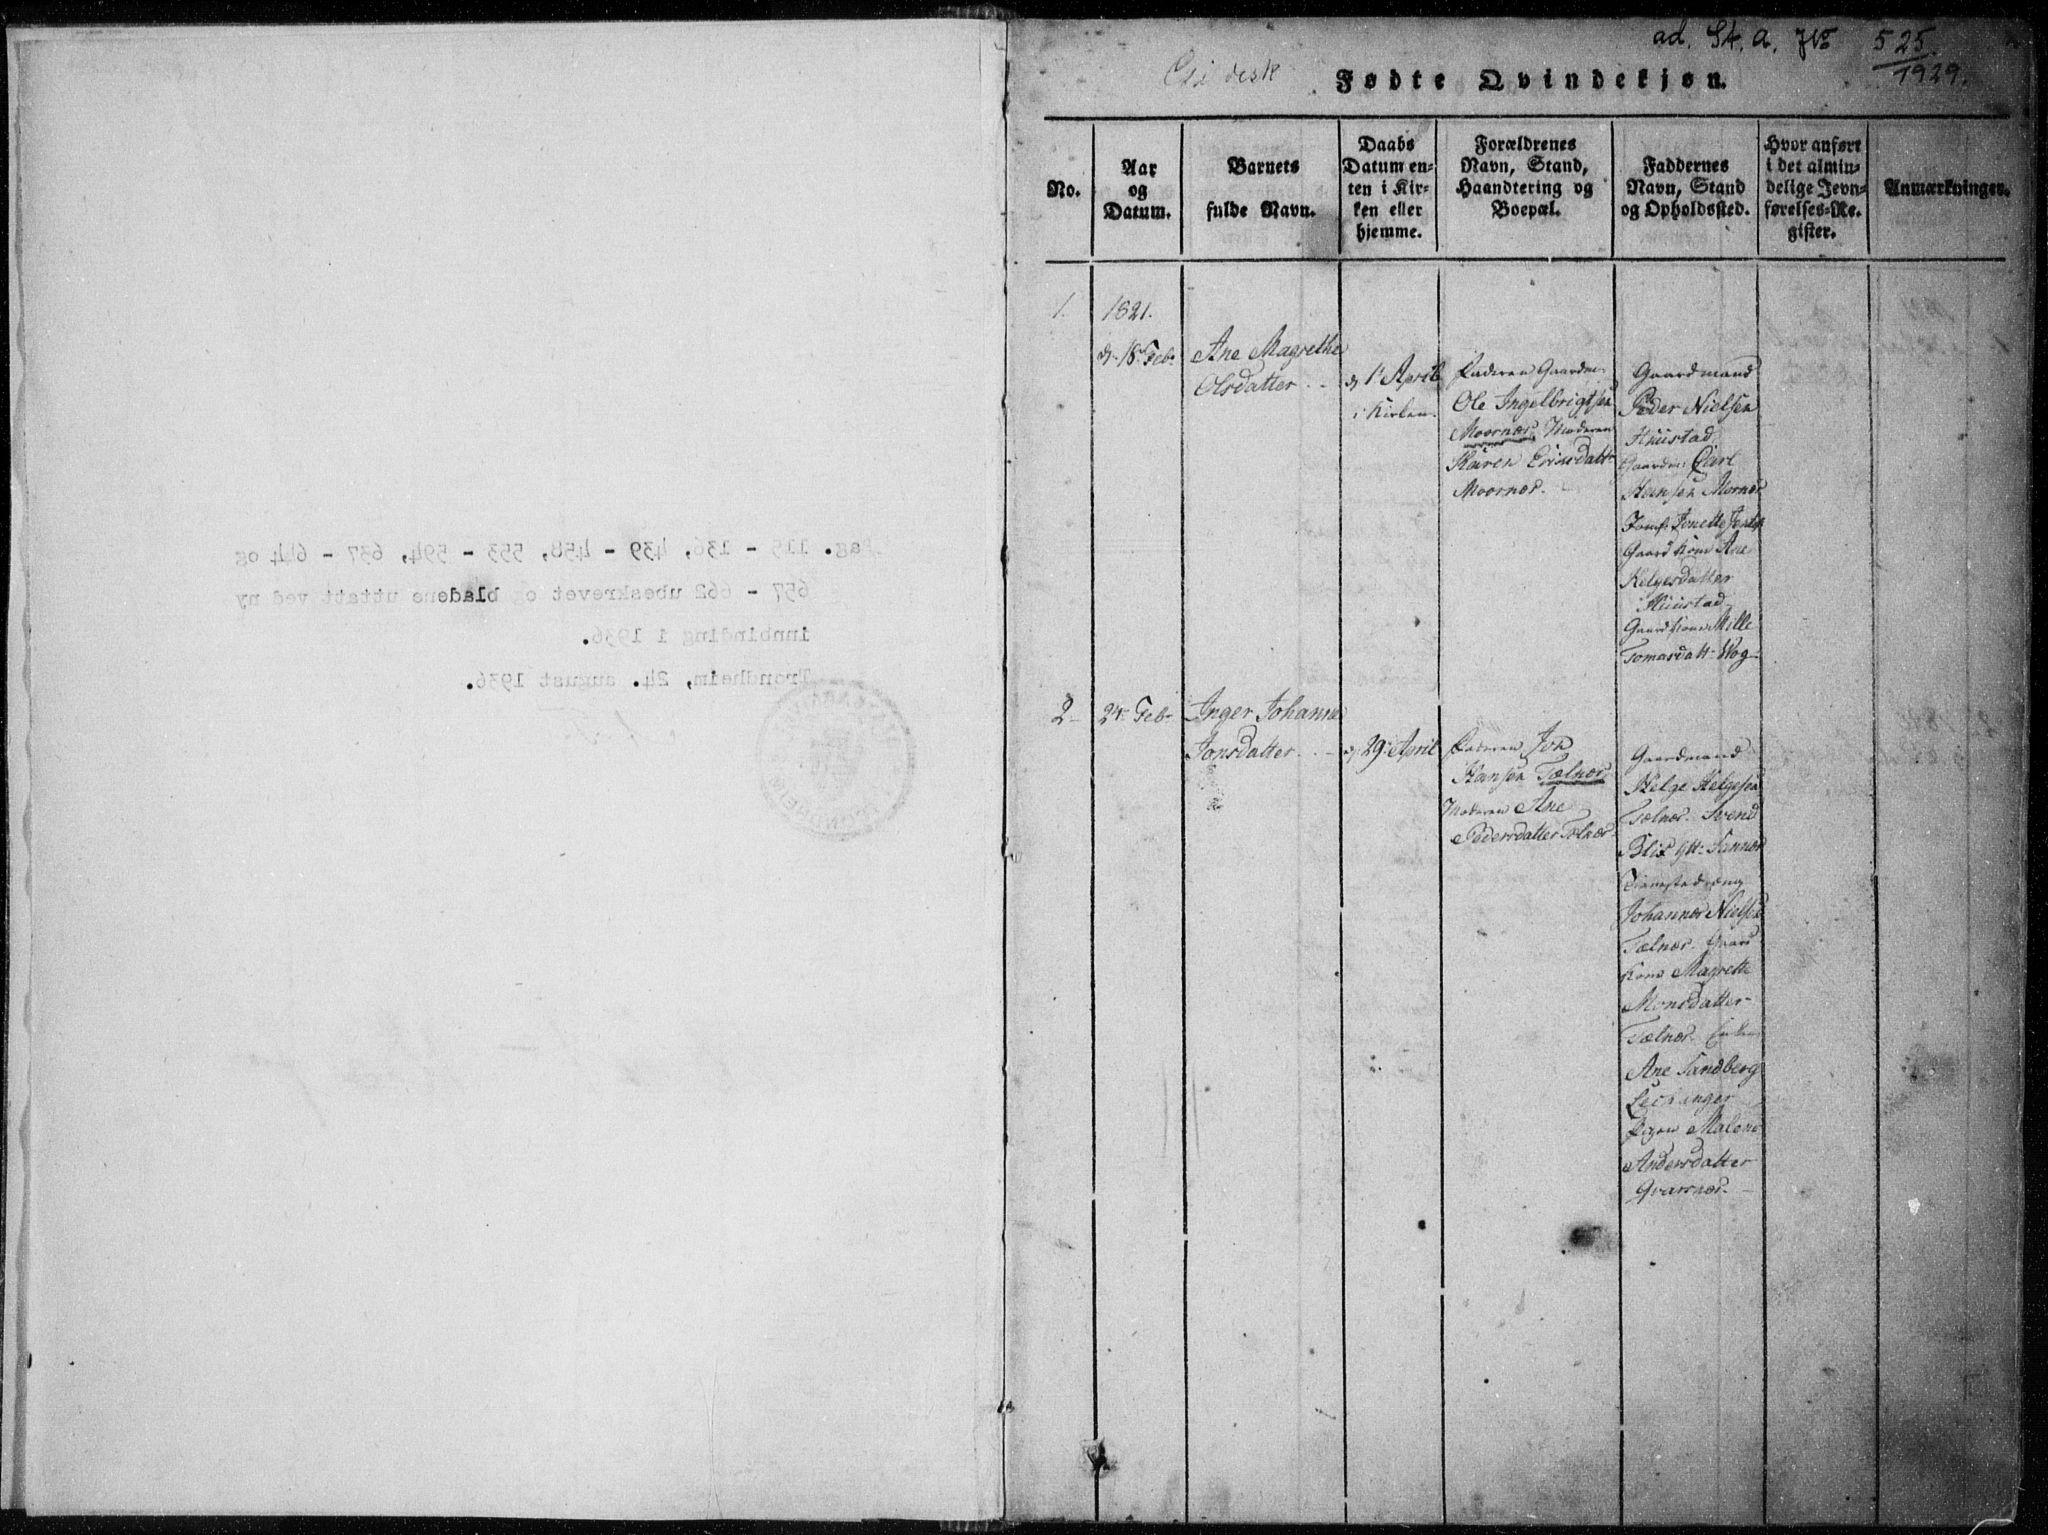 SAT, Ministerialprotokoller, klokkerbøker og fødselsregistre - Nordland, 805/L0096: Ministerialbok nr. 805A03, 1820-1837, s. 0-1